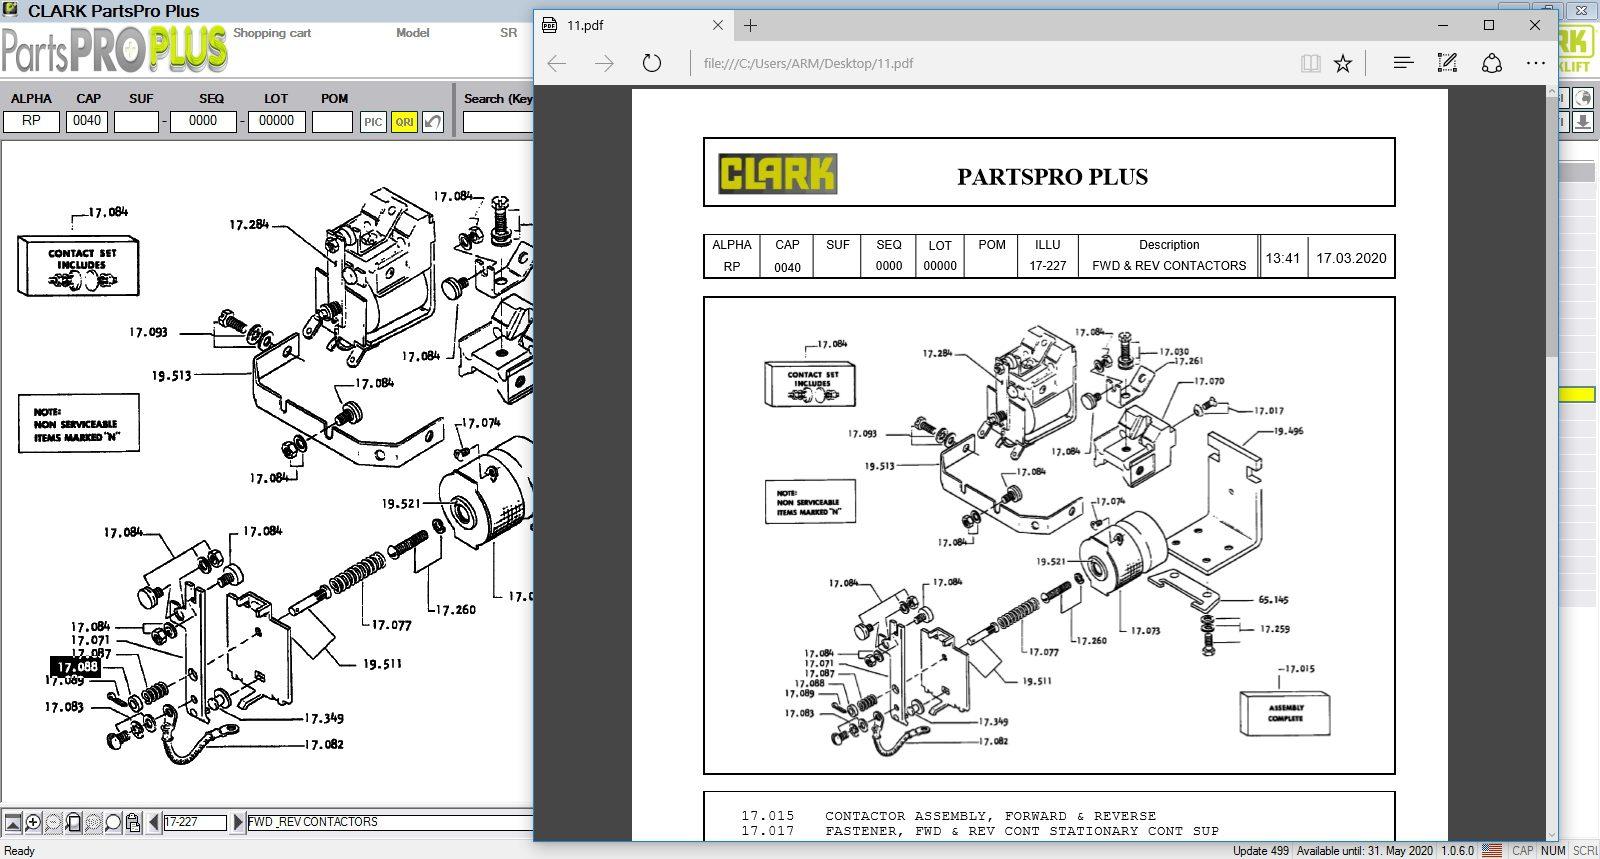 Clark_ForkLift_Parts_Pro_Plus_v499_032020_10